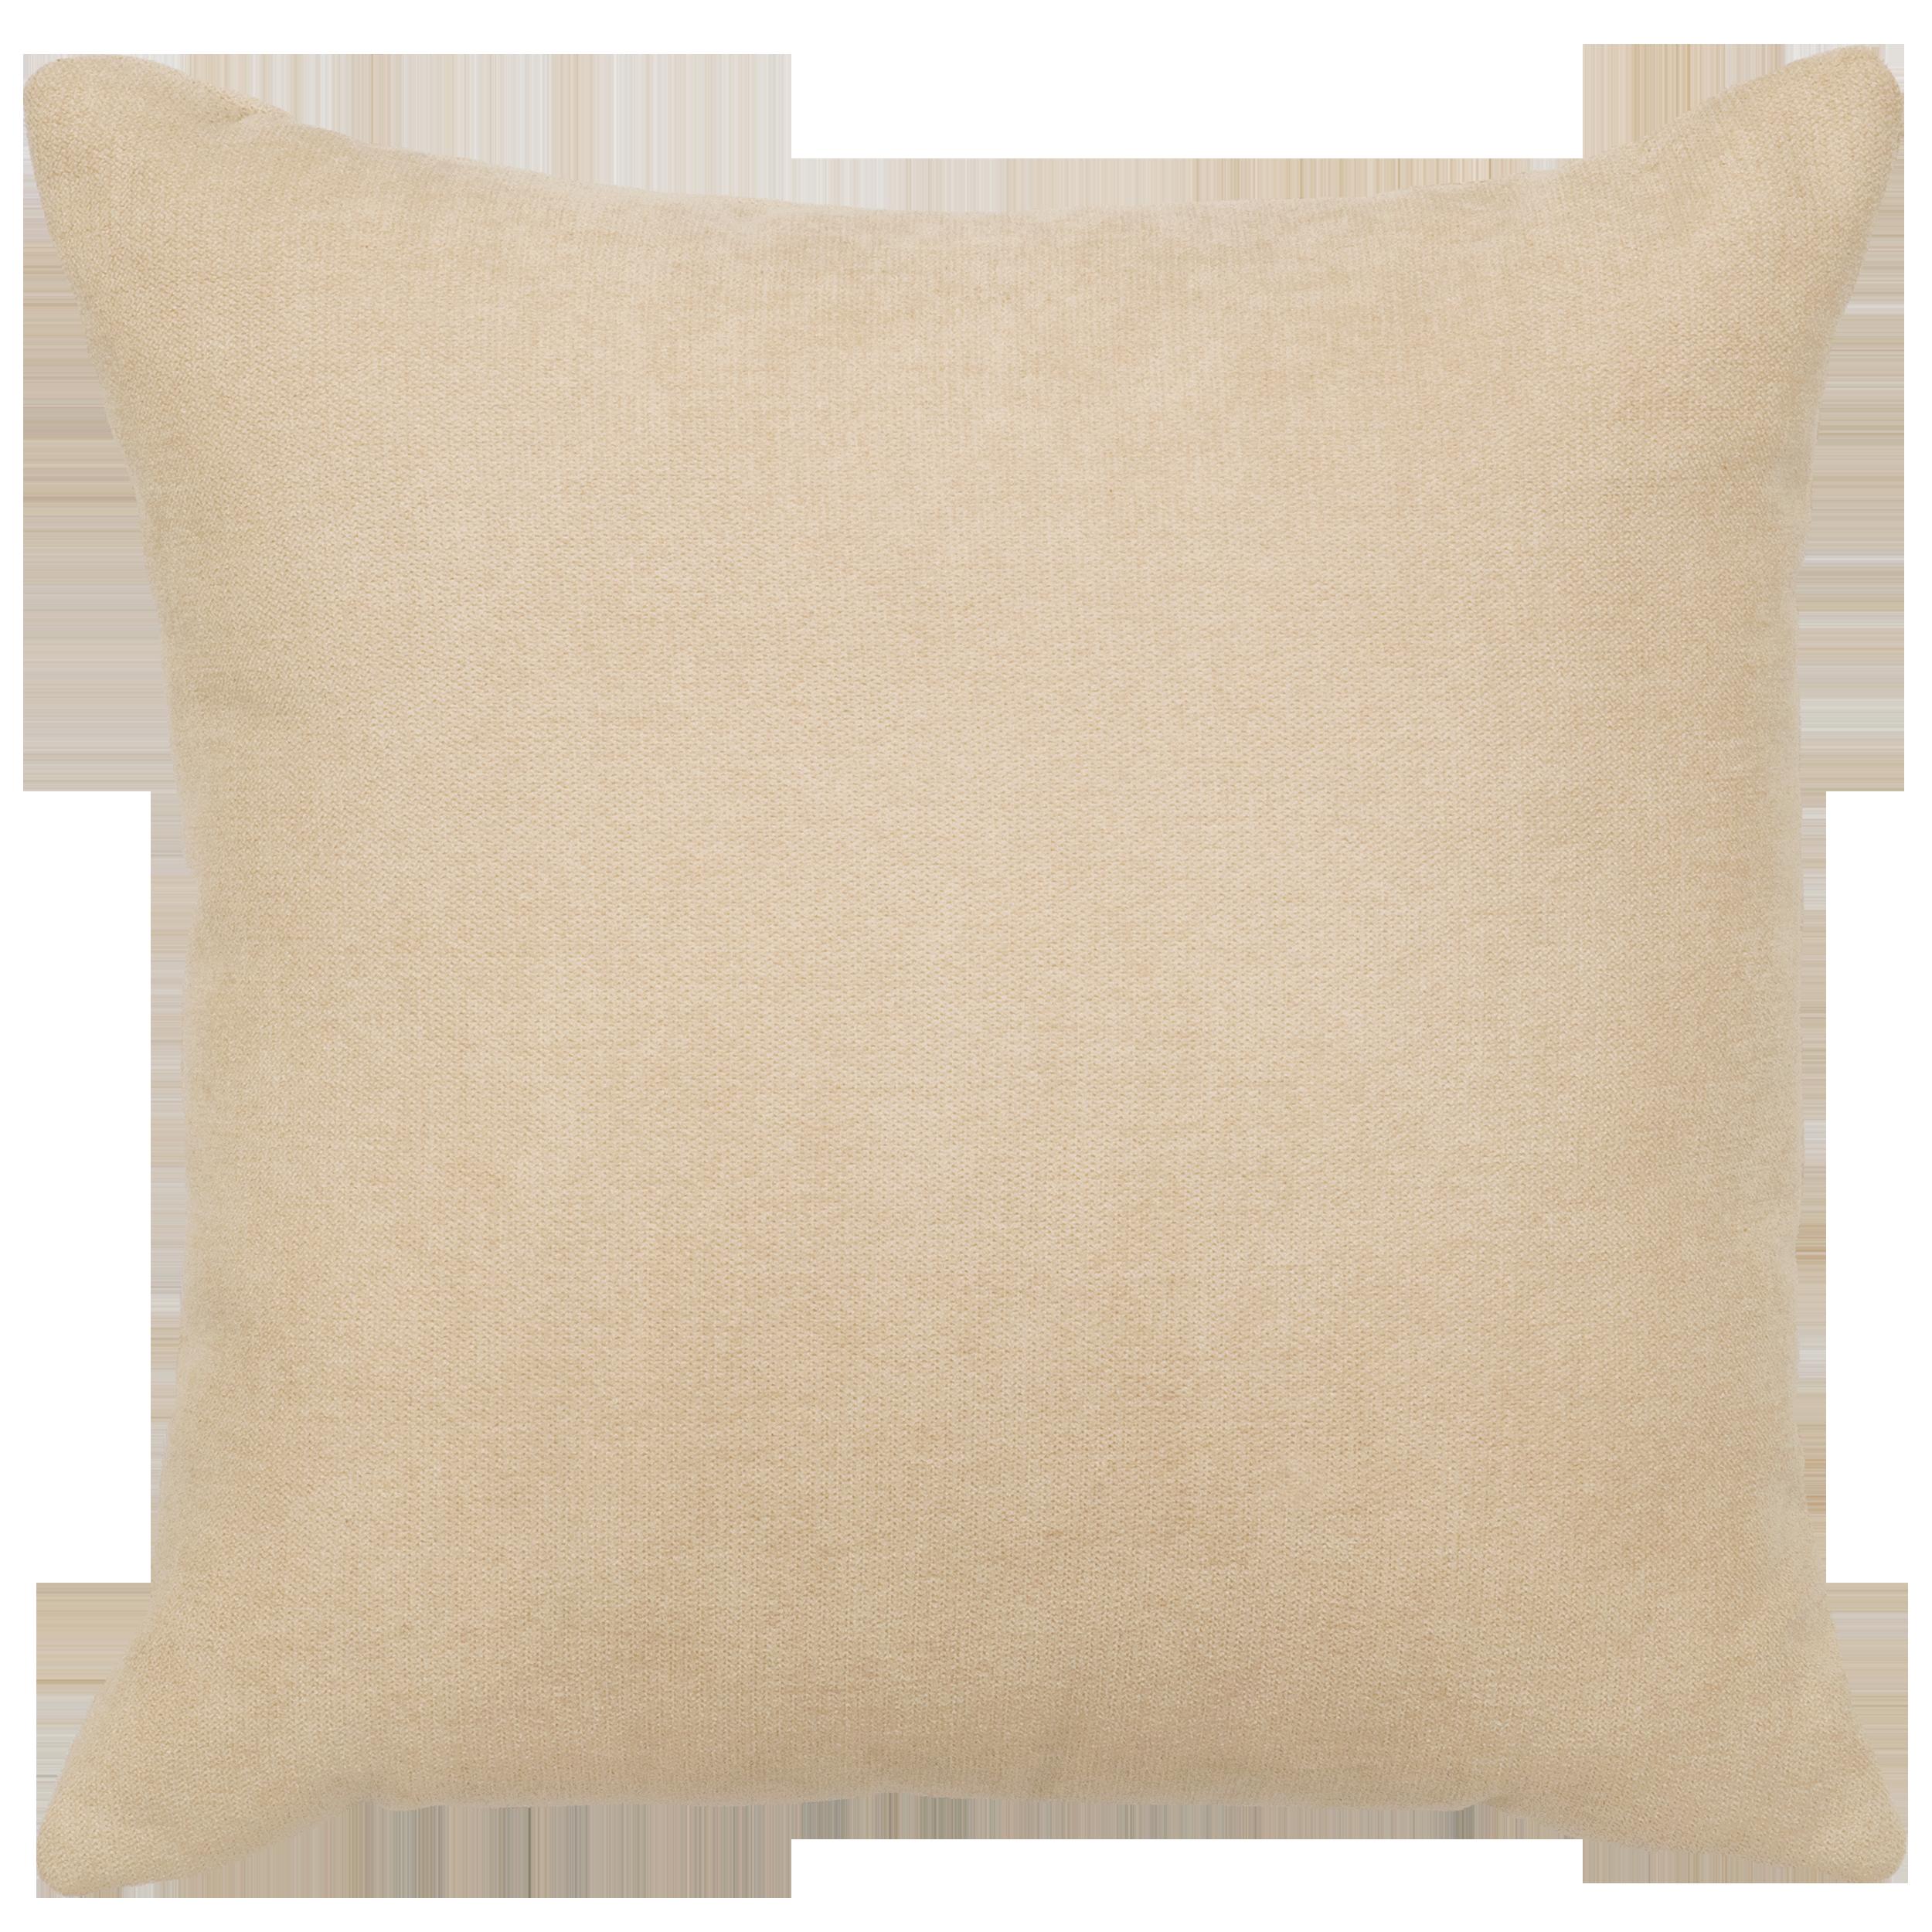 Caprice Hemp - Standard Fabric